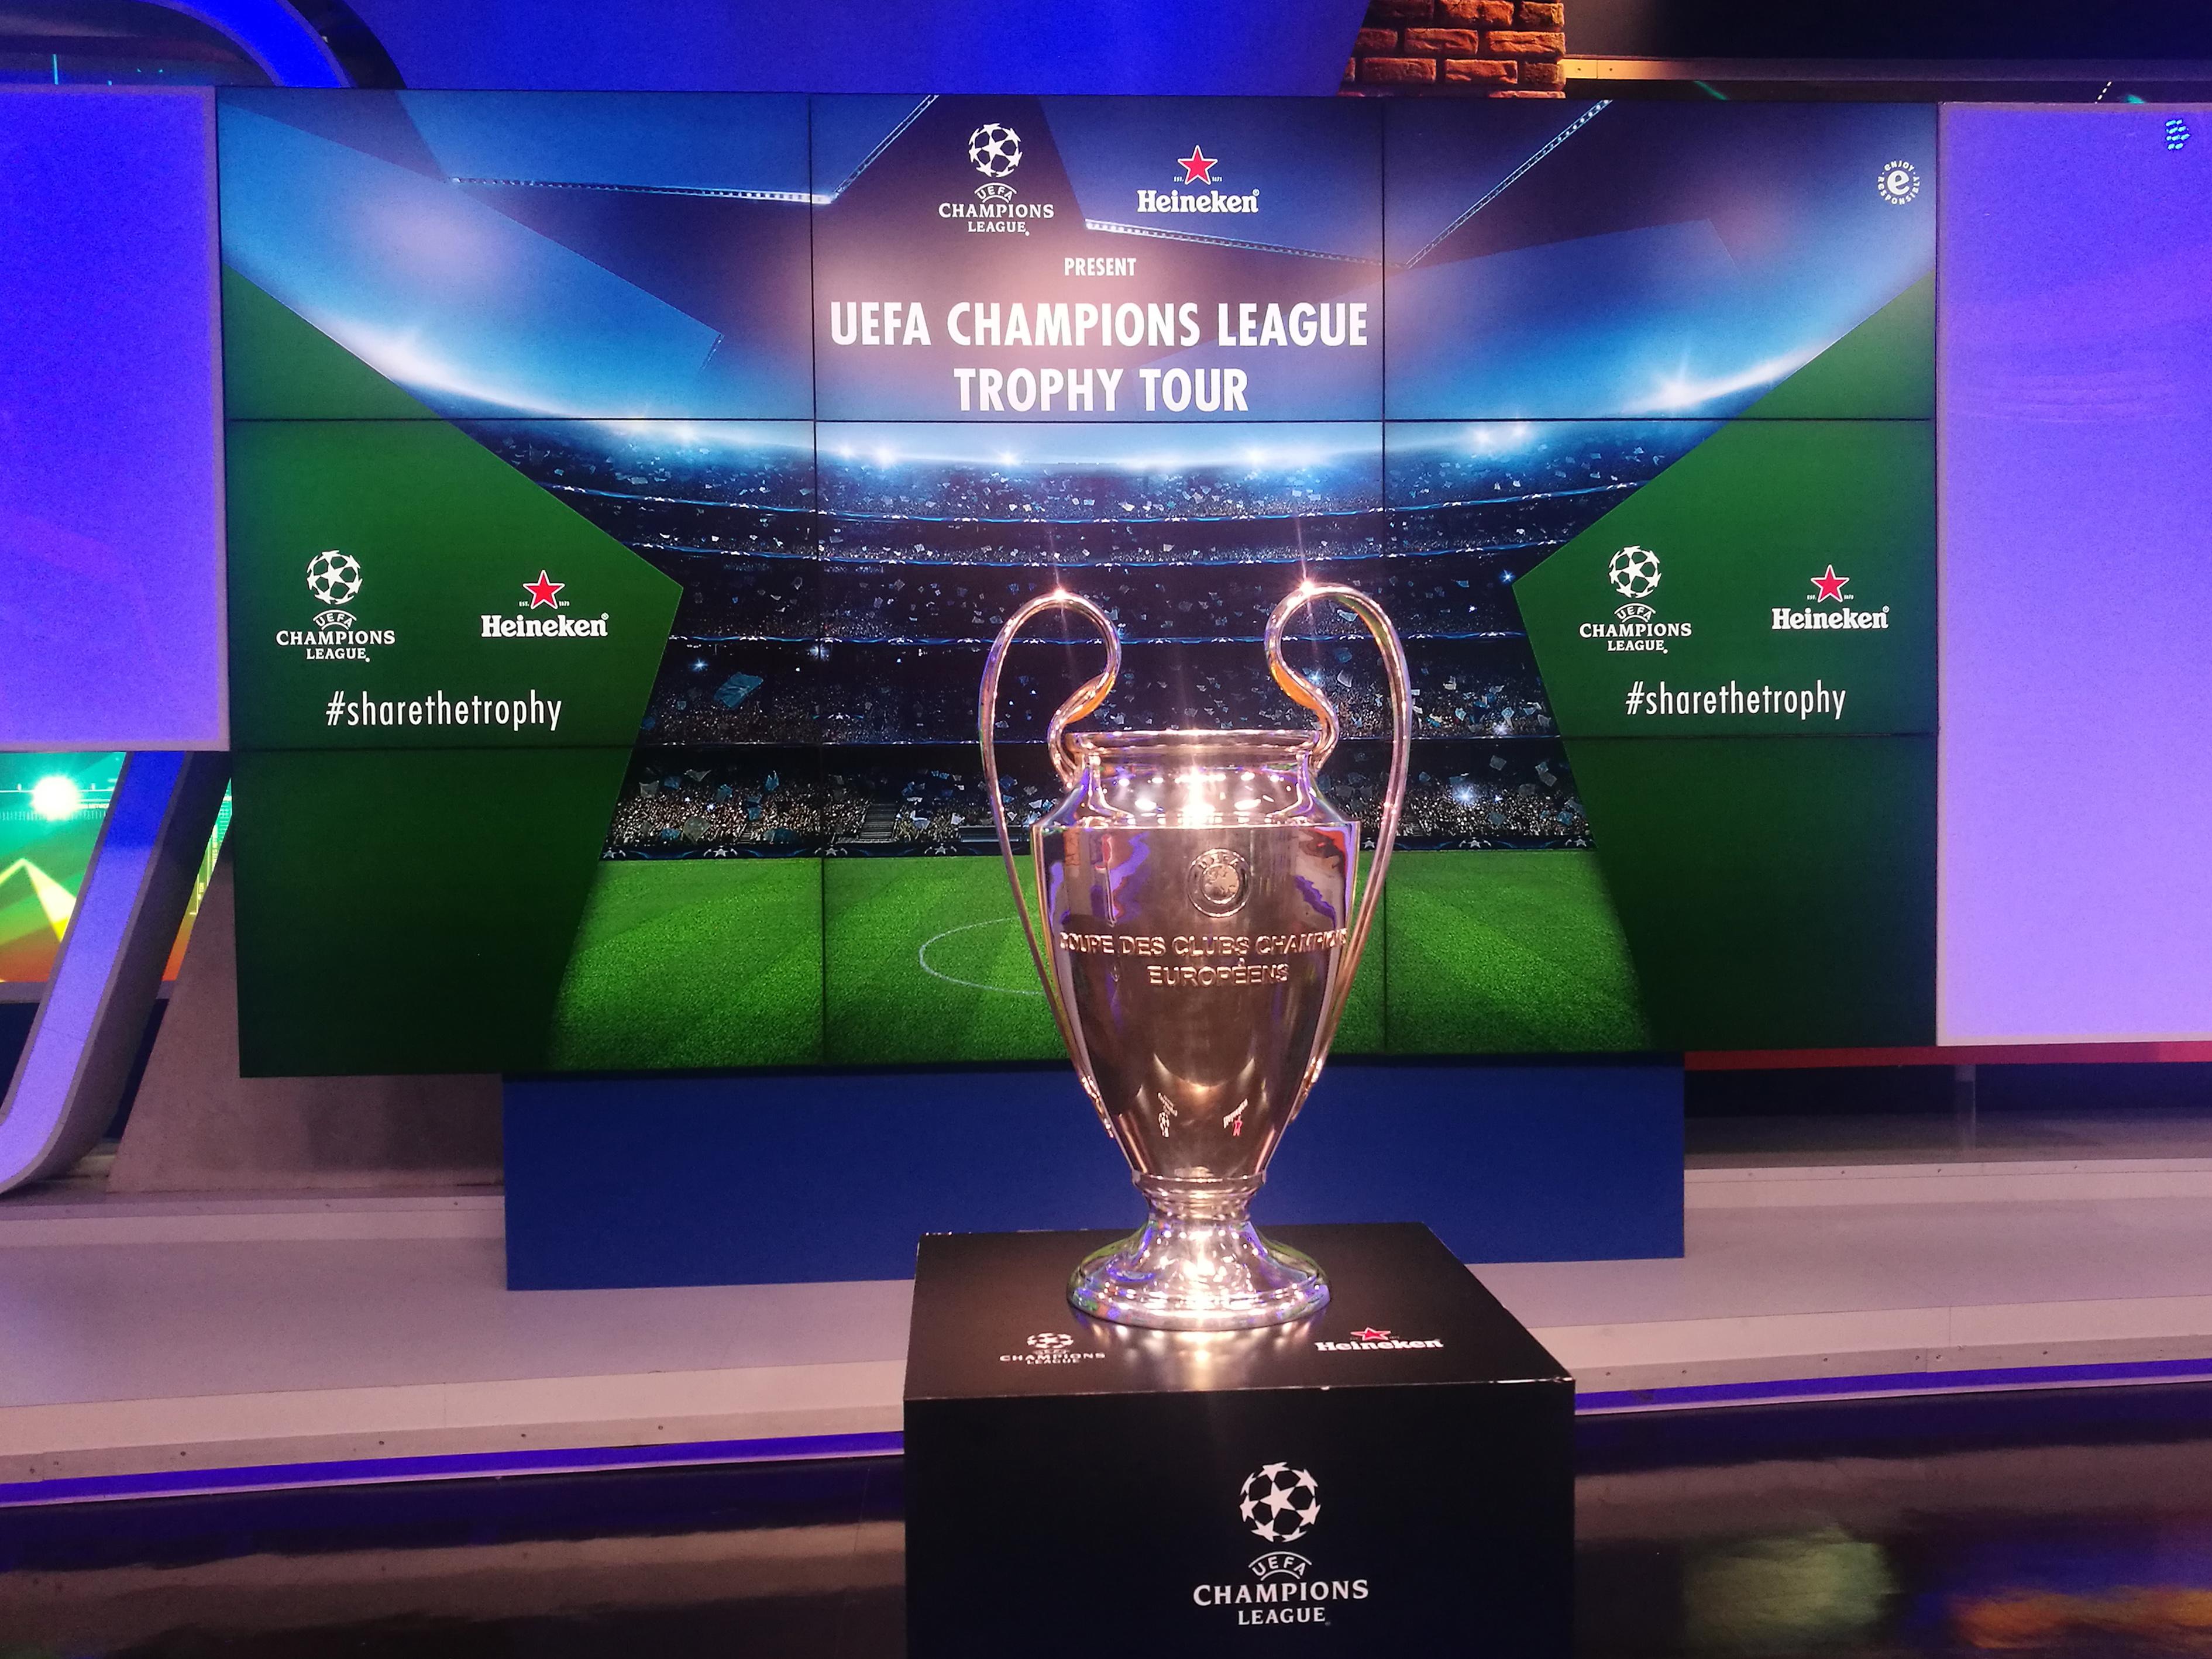 Champions League, Fan Fest, Heineken, Trofeo, Tour, CDMX, Aficionados, 2018, Convivencia, Accesos